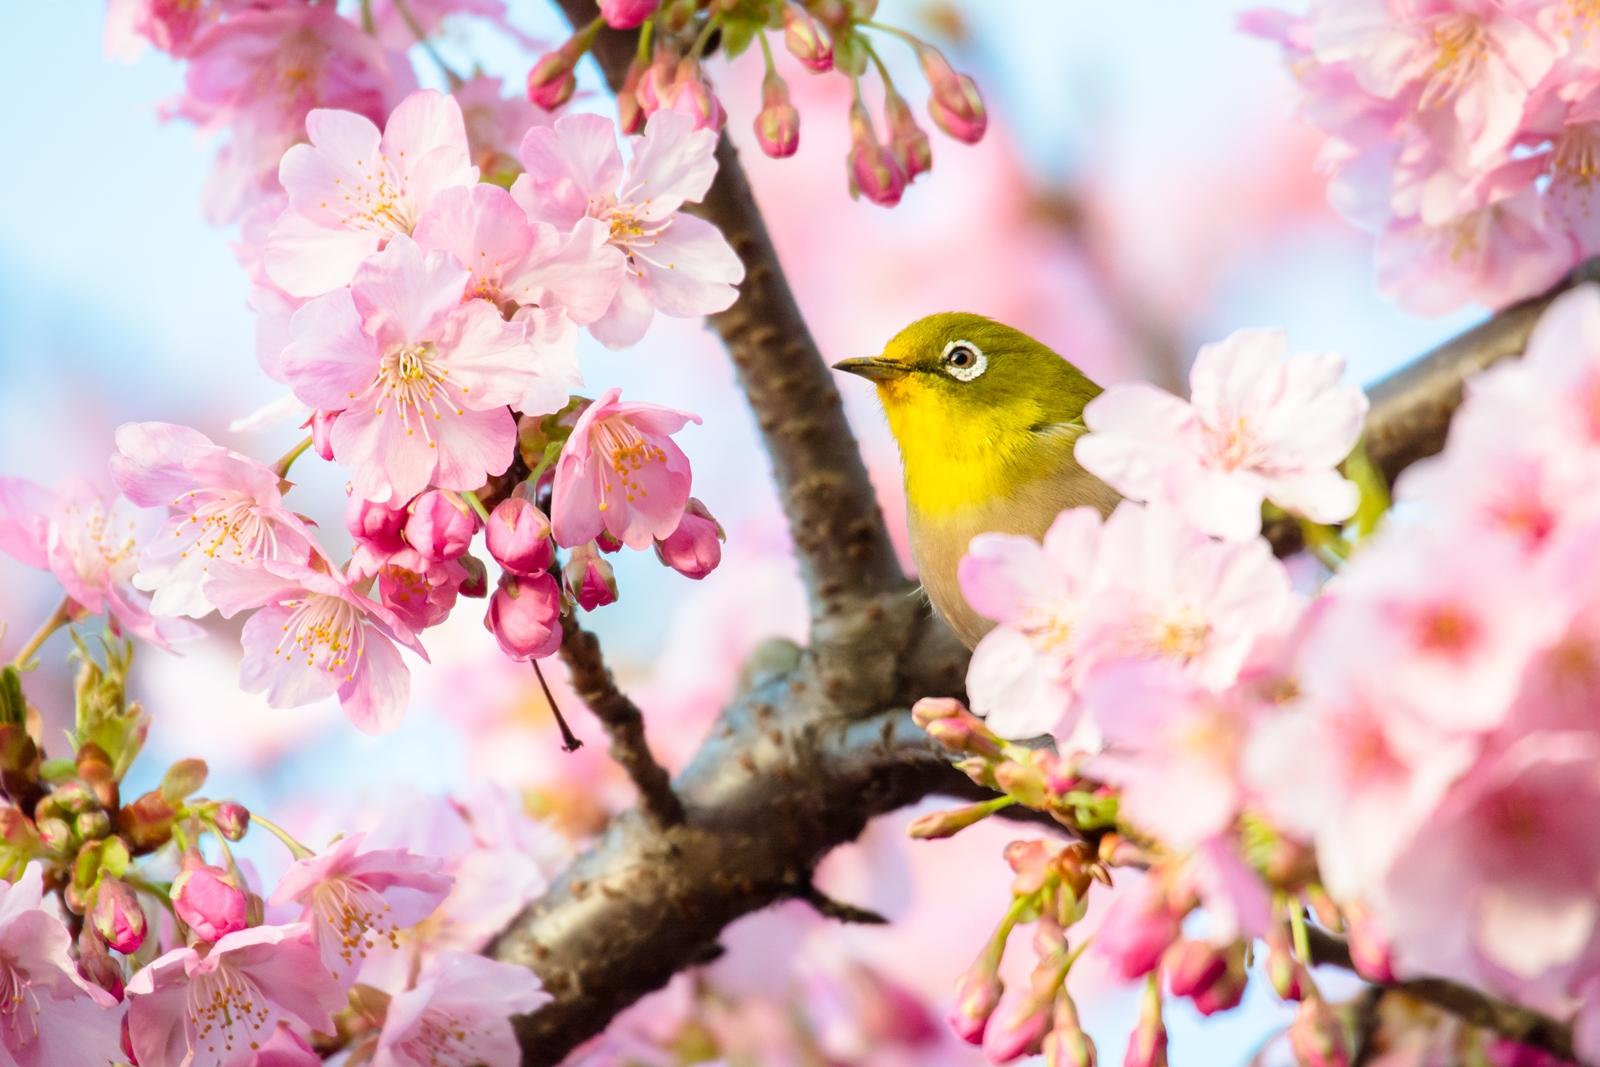 Photo: 特等席 Special seat.  とっても贅沢な席 まわりを桜に覆われて 美味しい蜜も飲み放題 ここは誰にも譲れない  Kawazu cherry trees and Japanese White-eye. (大井松田の河津桜とメジロ) #fujisakura #cooljapan #365cooljapanmay  #birdphotography #birds  #kawaii  Nikon D7100 SIGMA APO 50-500mm F5-6.3 DG OS HSM [ Day312, March 20th ]